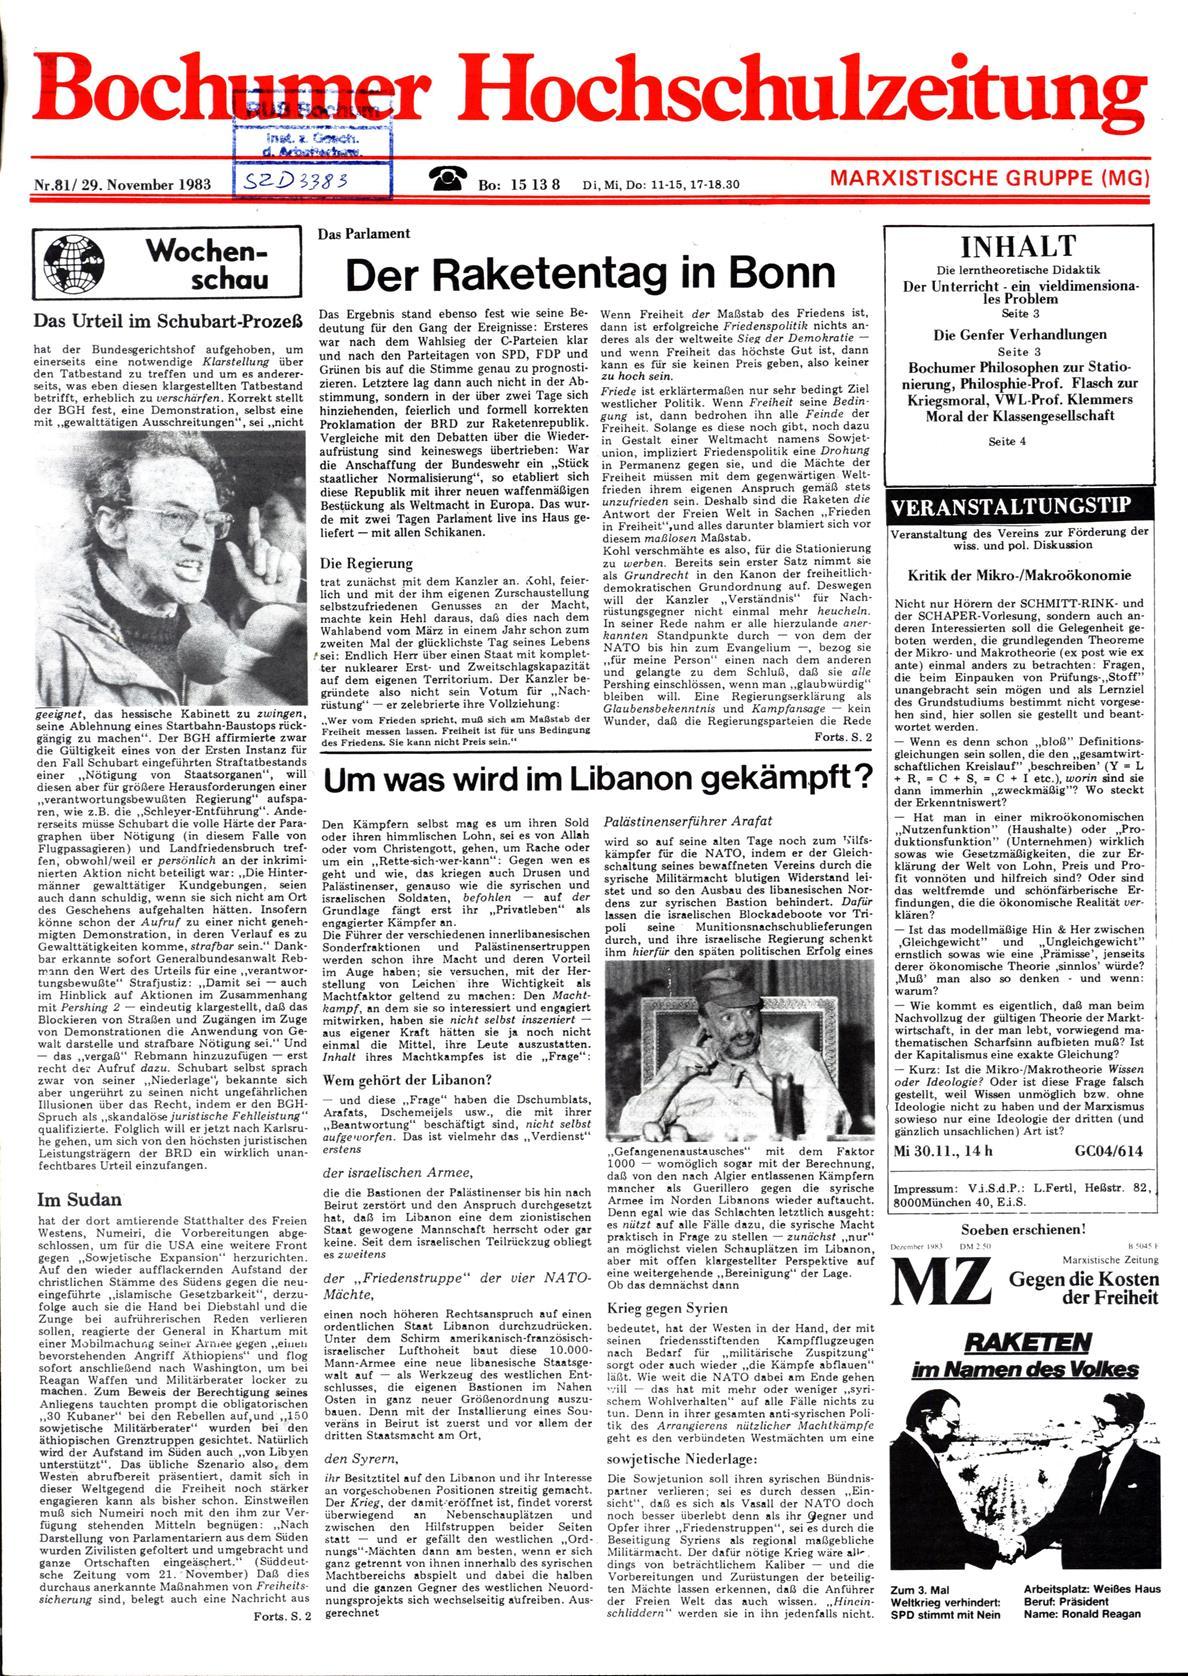 Bochum_BHZ_19831129_081_001